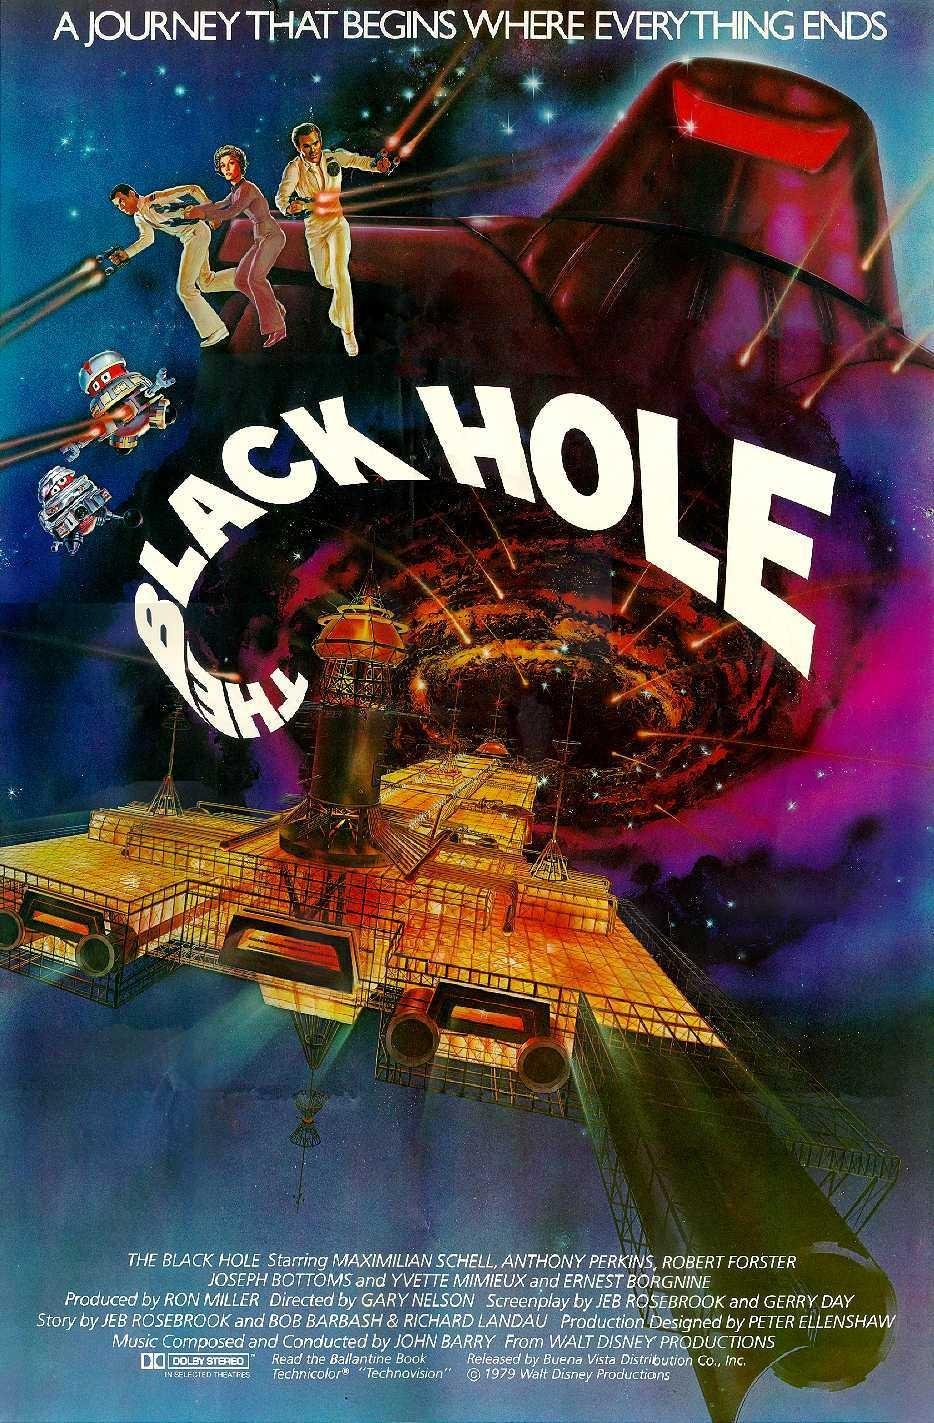 [Image: the-black-hole-1971.jpg]